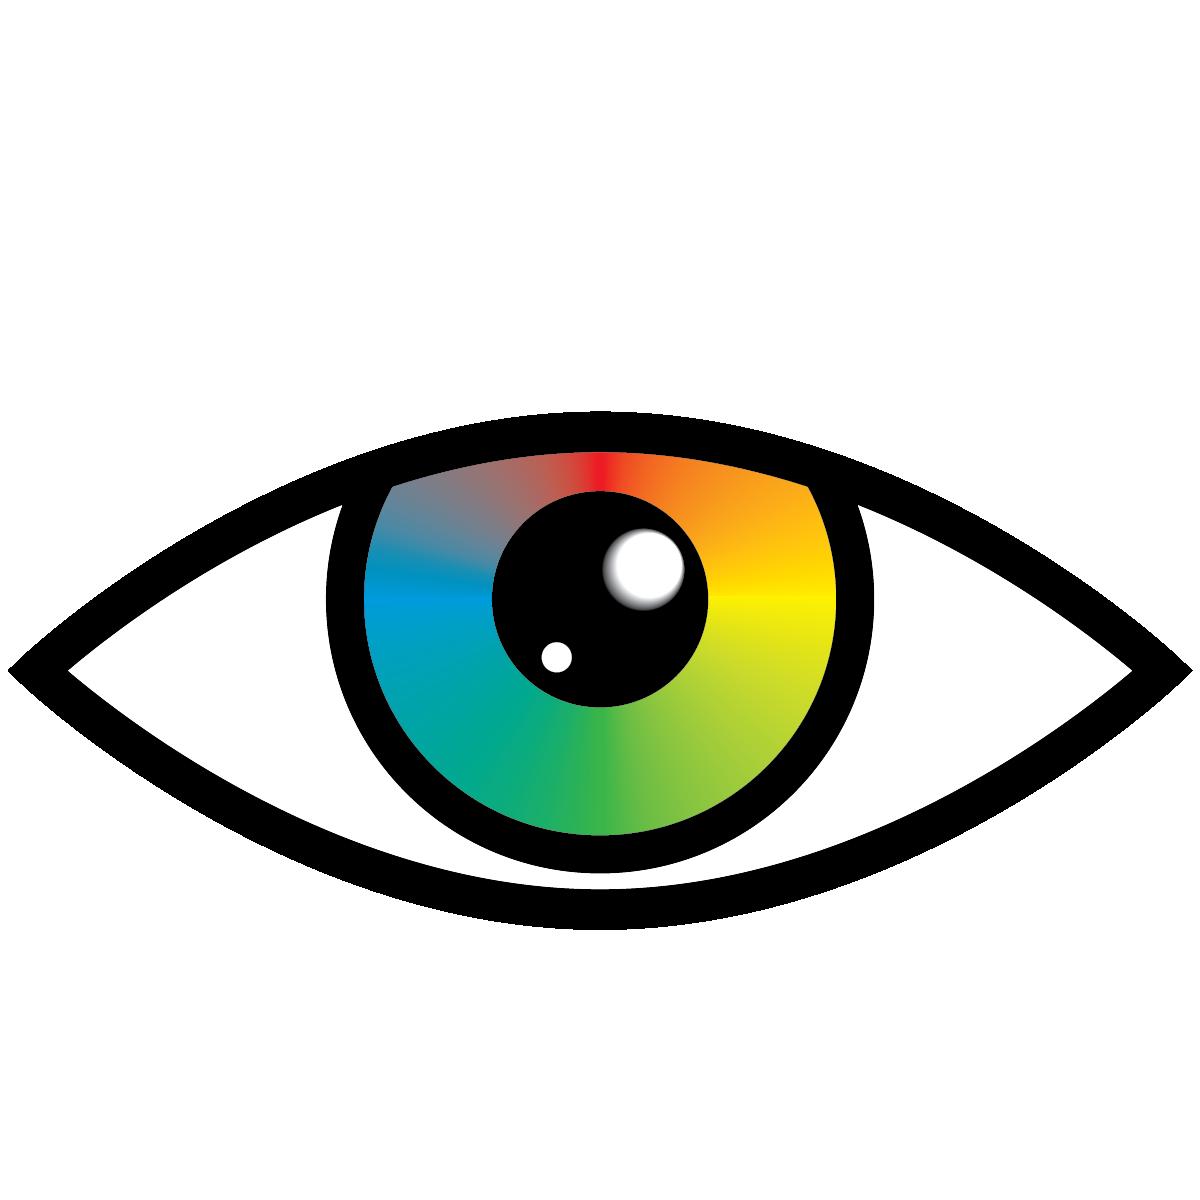 Eye clipart #9, Download drawings